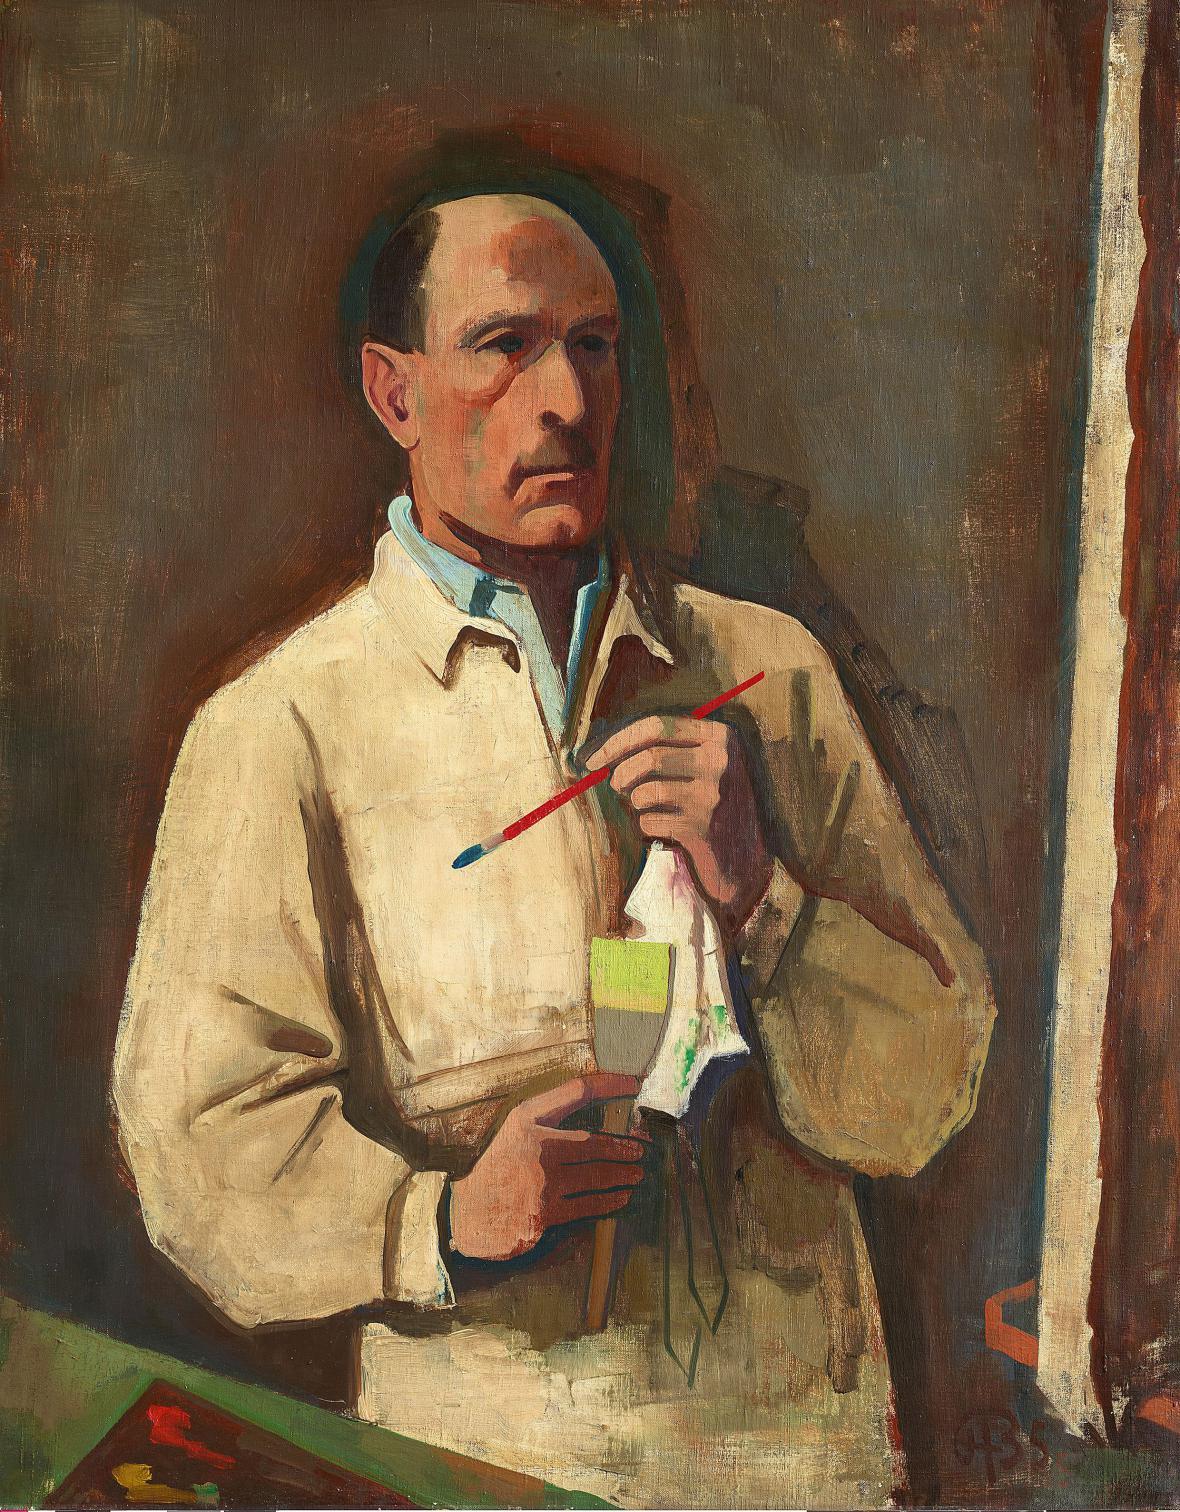 Karl Hofer / Autoportrét, 1935